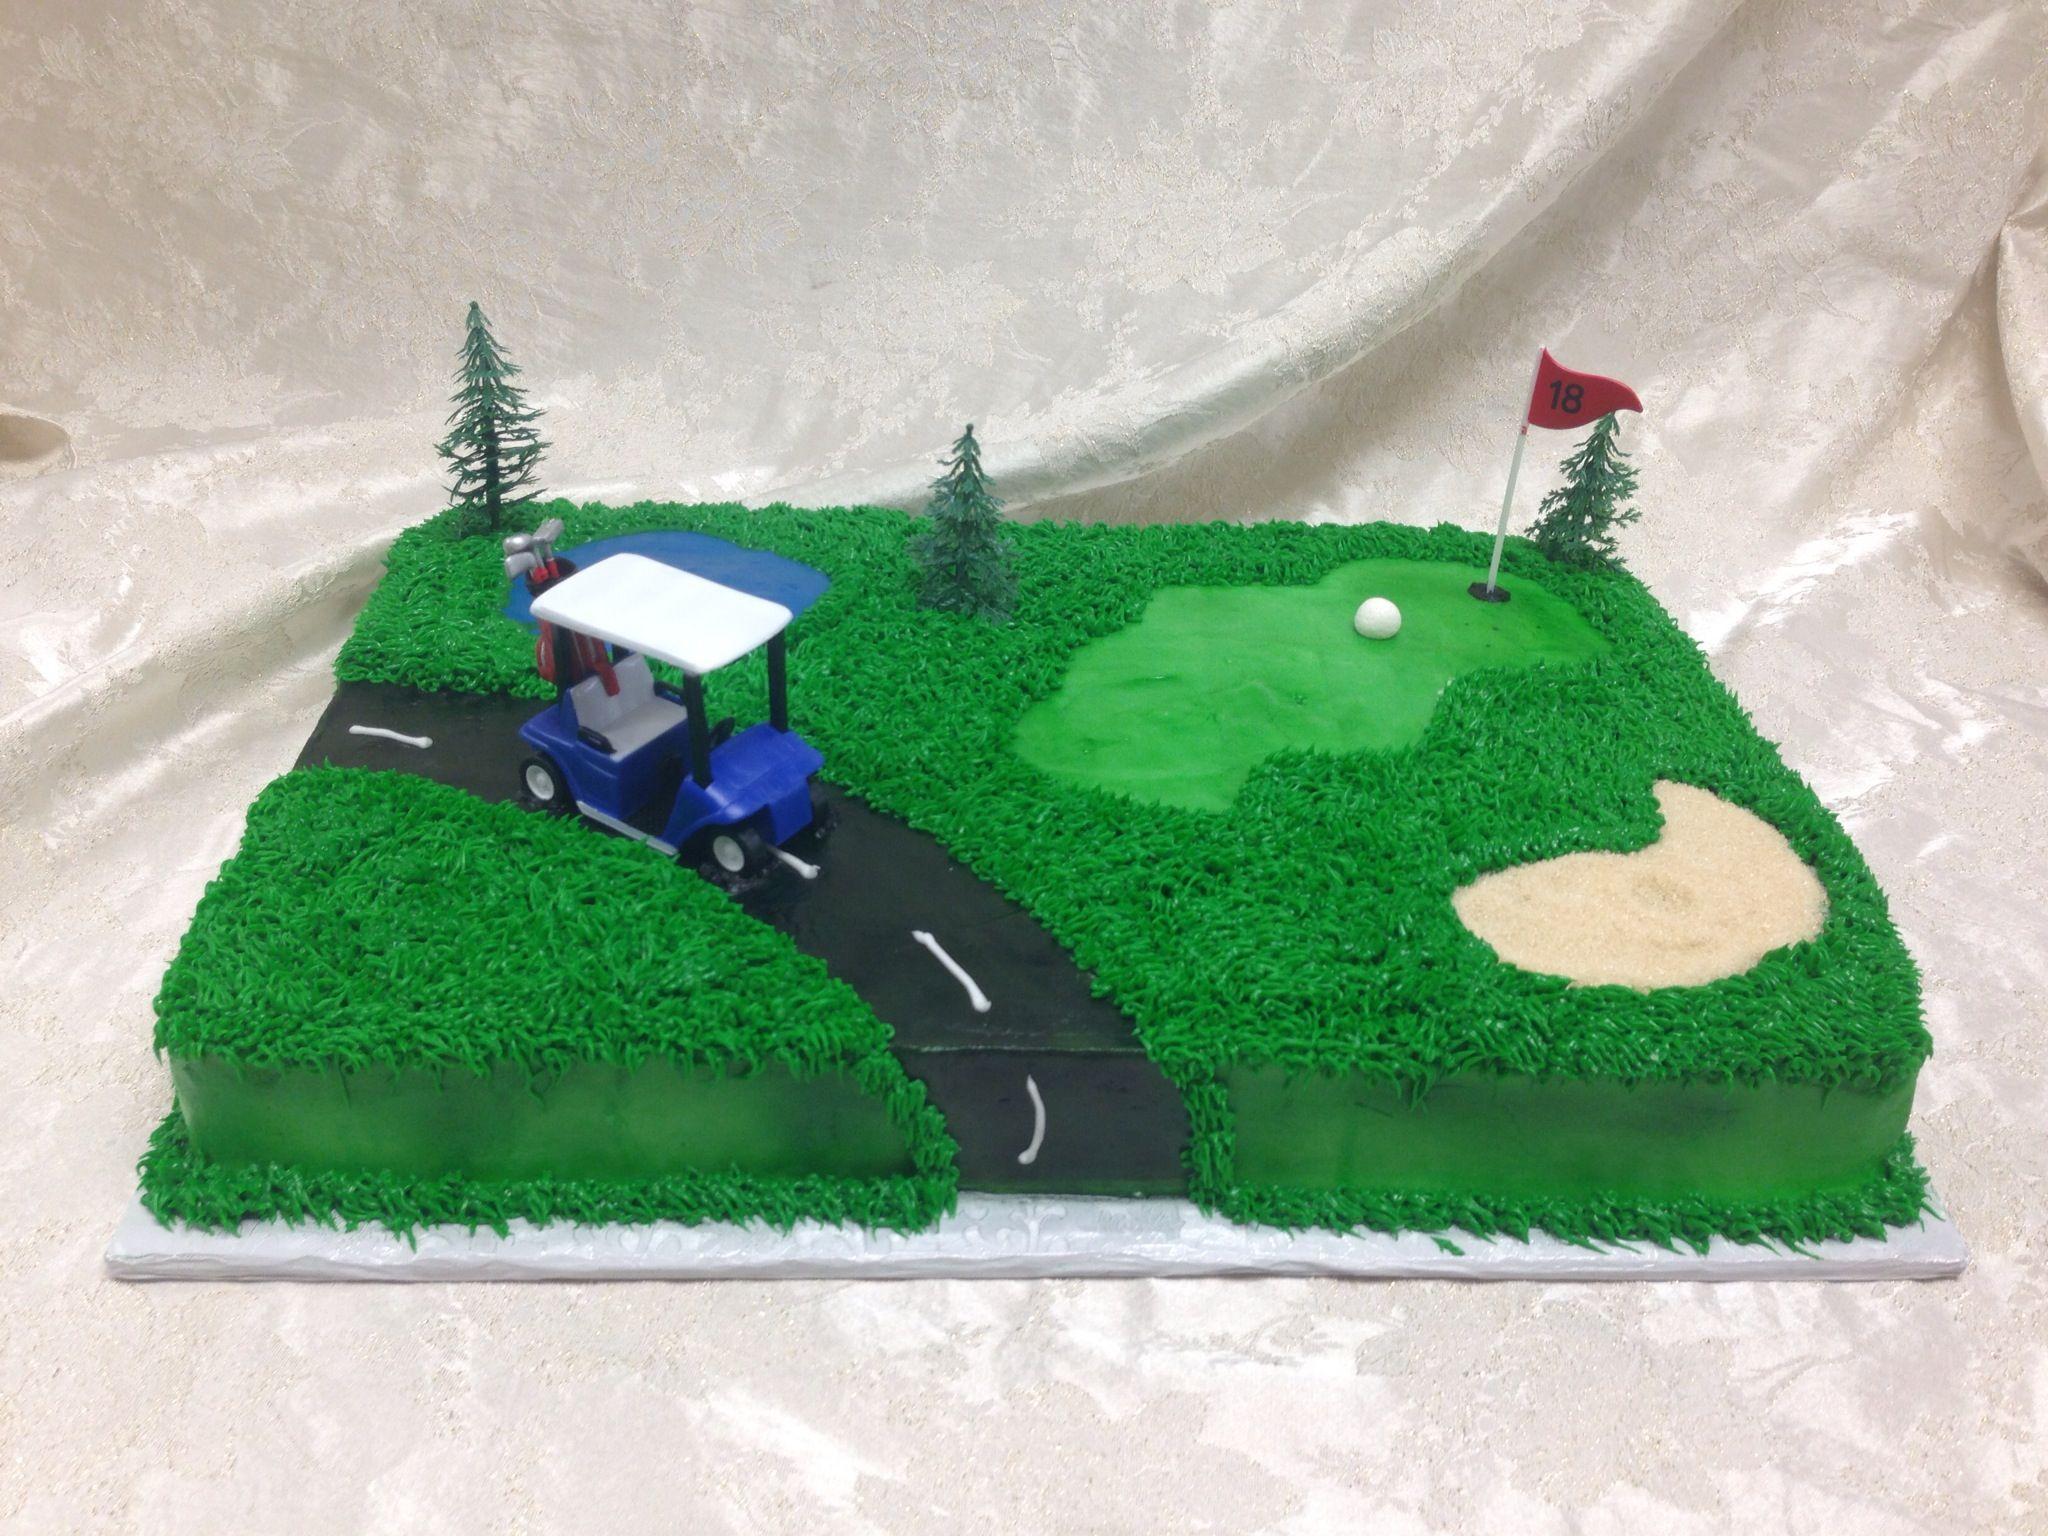 Golf Cake Cakes Pinterest Golf Cake And Birthdays